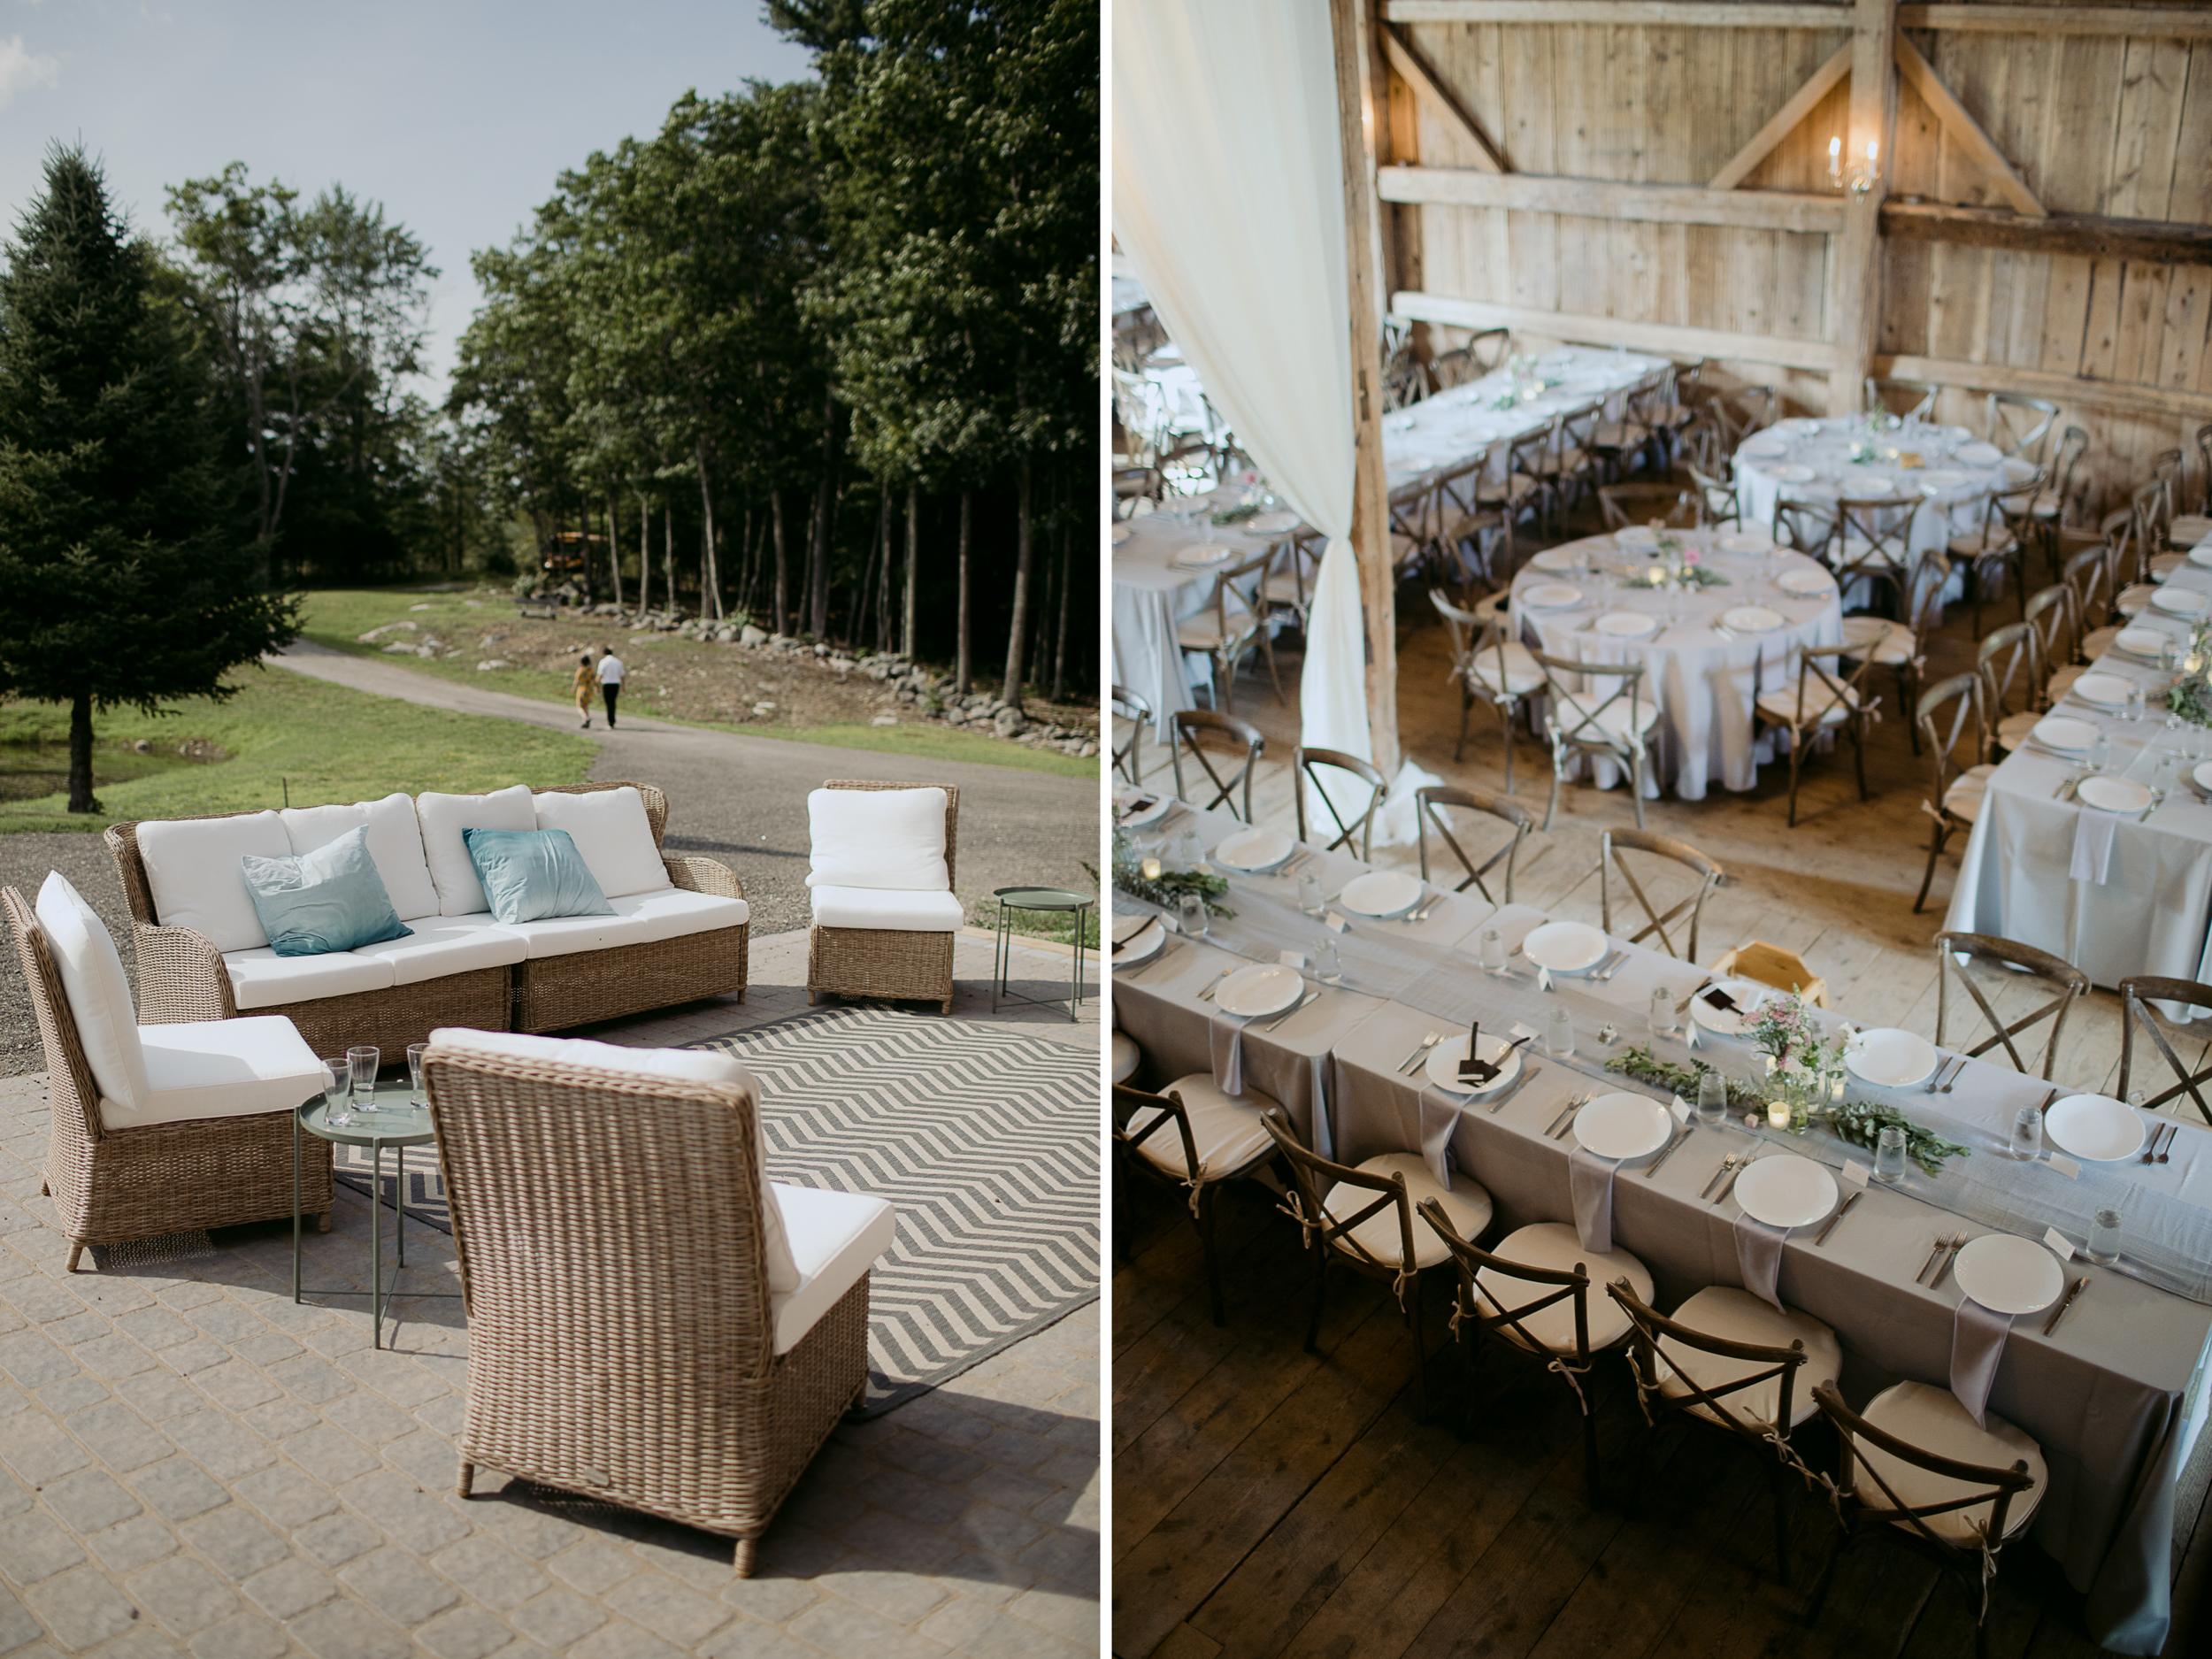 william_allen_farm_wedding_pownal_maine_ilkatayler-29.jpg